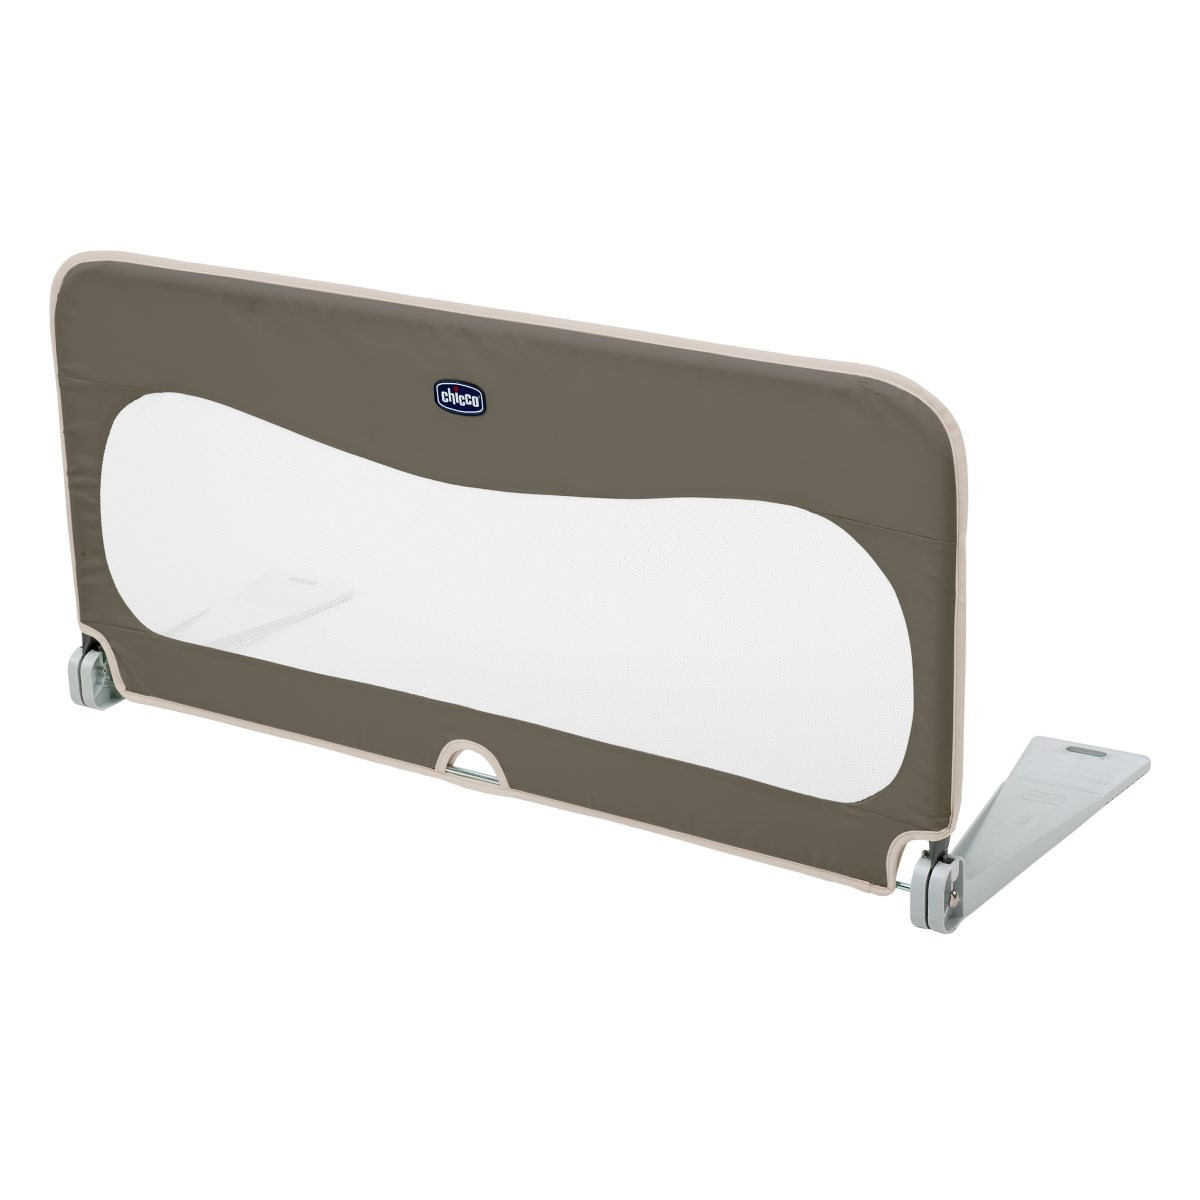 Chicco: Барьер для кровати Natural 135 см